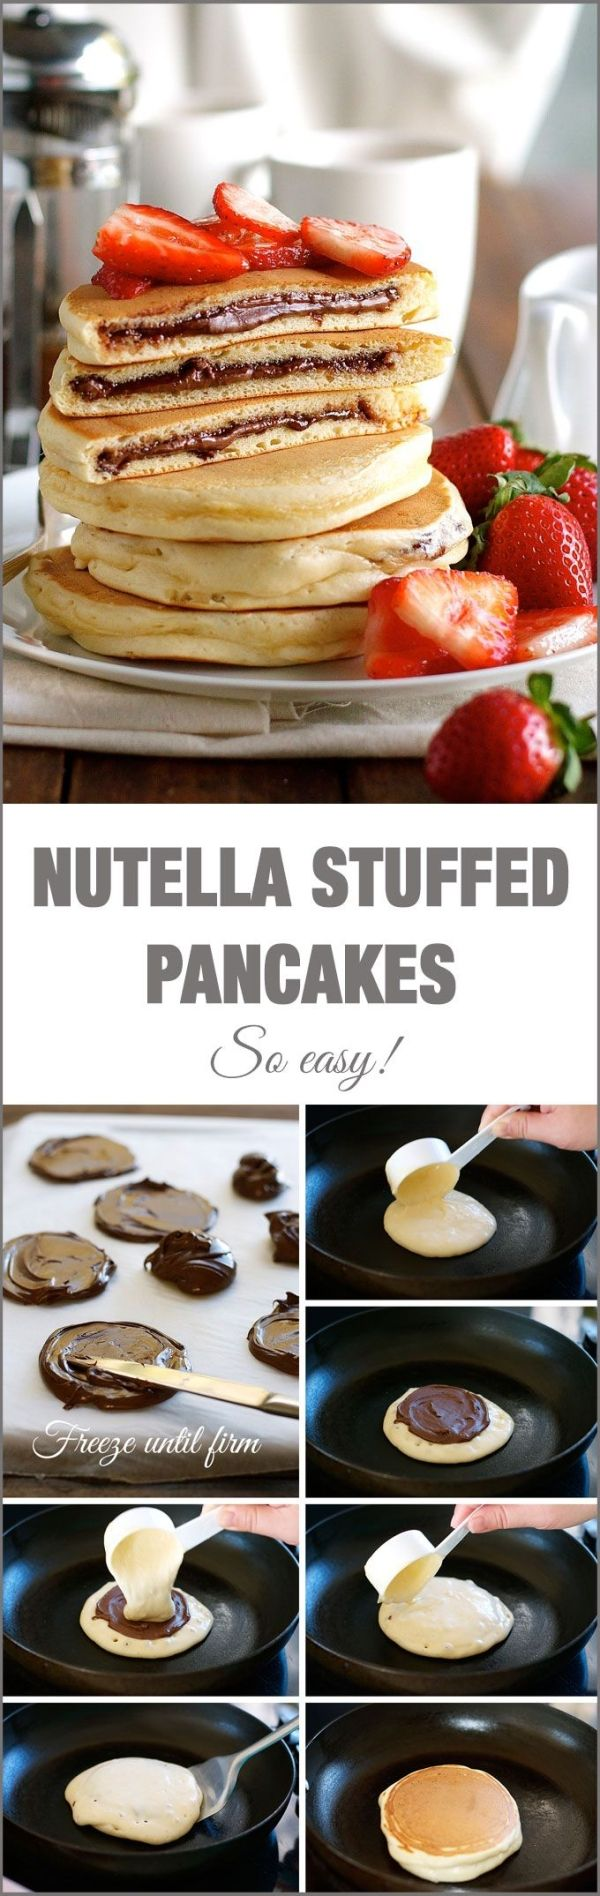 Nutella Stuffed Pancakes  Frozen Nutella Discs Makes It A Breeze To Make  The Nutella Stuffed